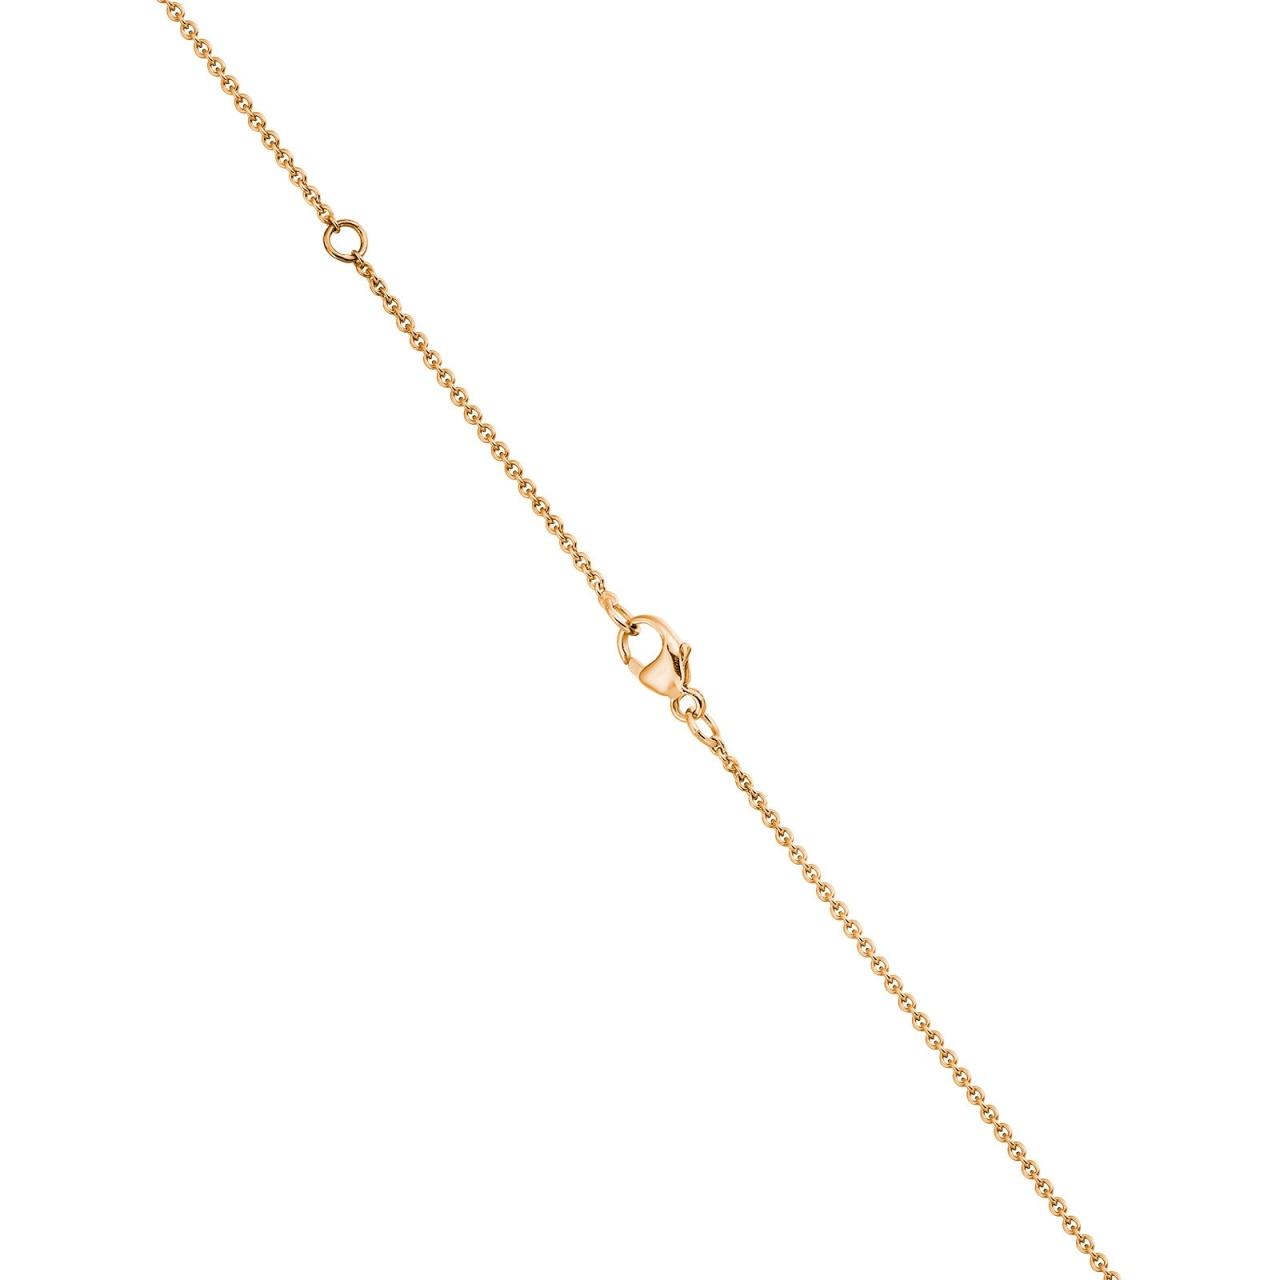 Mythologie Dewdrop Akoya Pearl Pendant in Rose Gold-APVARRG1236-1